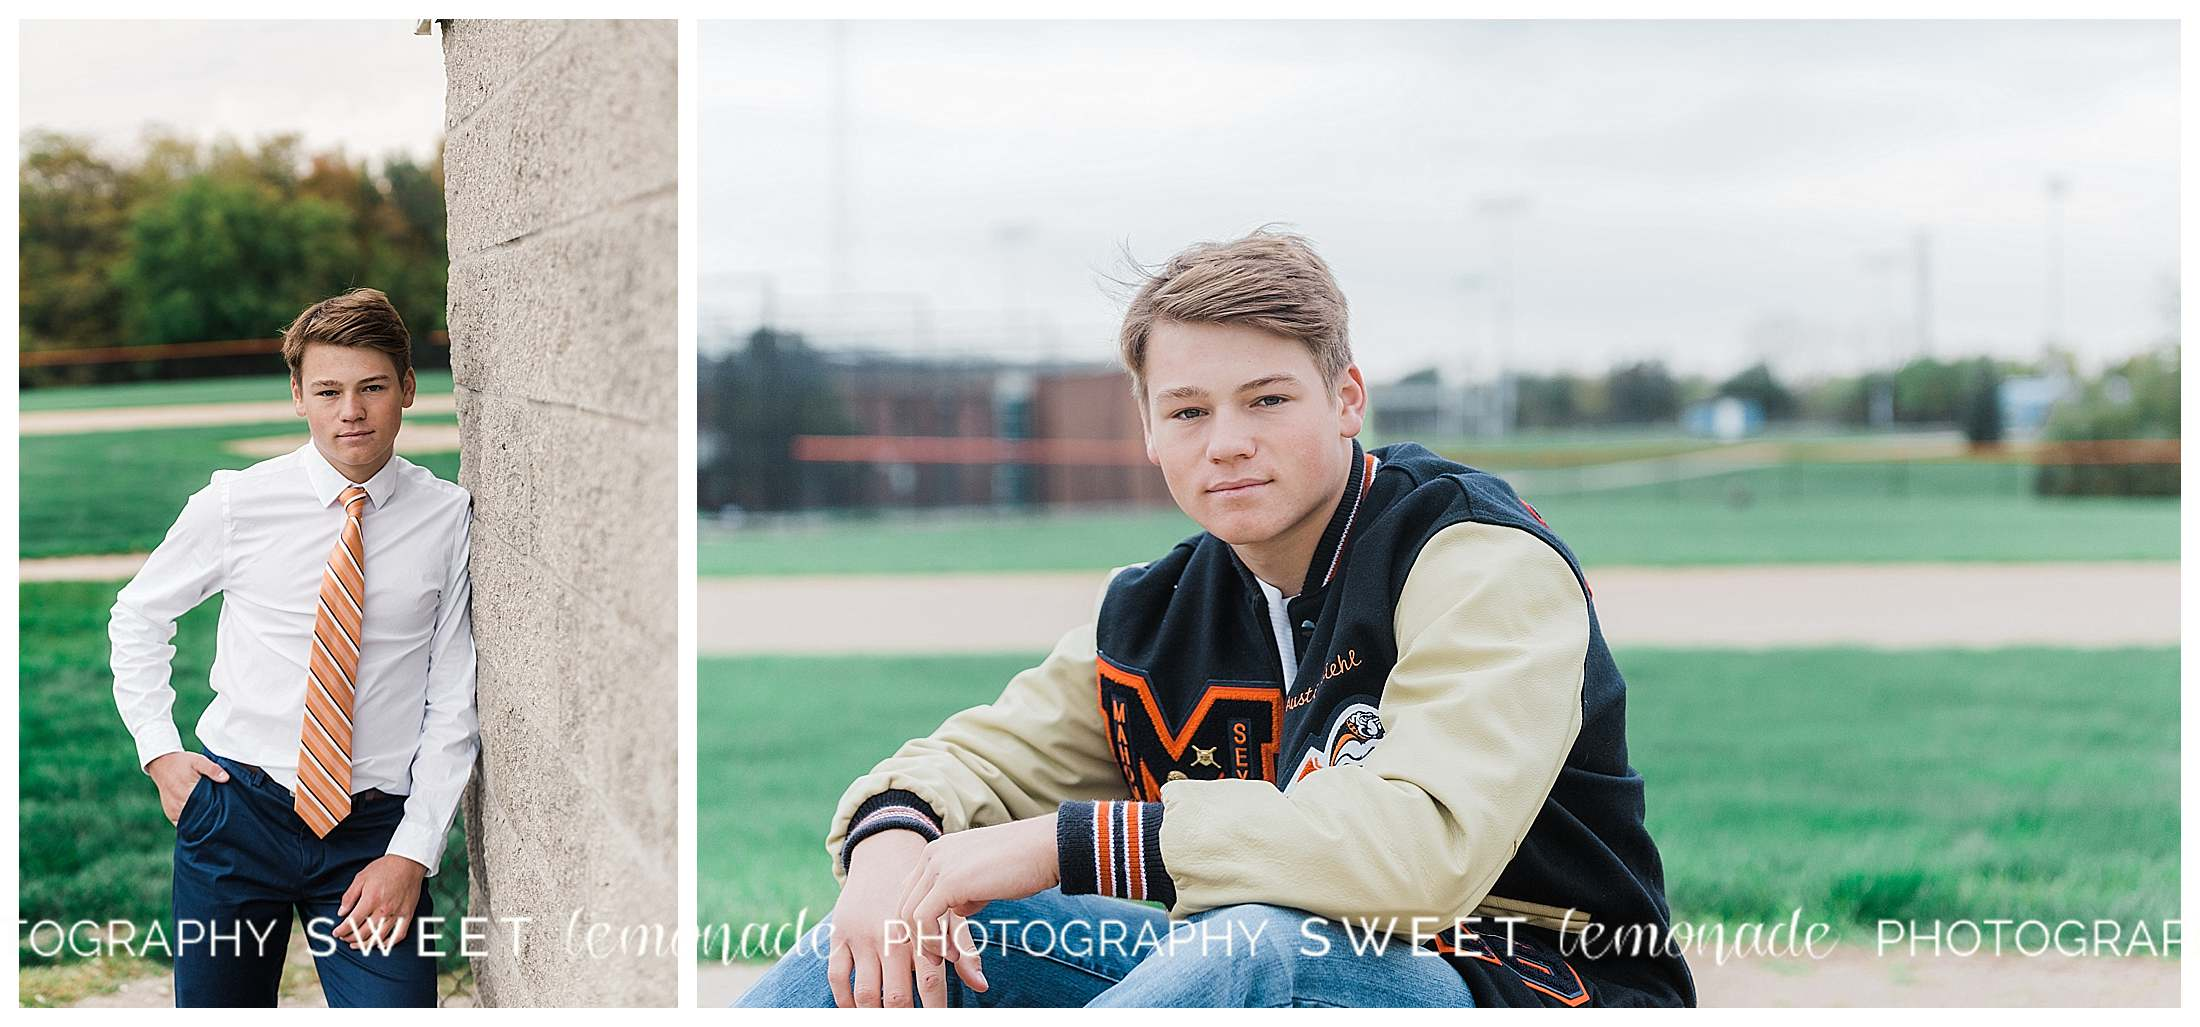 champaign-parkland-baseball-mahomet-illinois-senior-photographer-sweet-lemonade-photography_1805.jpg